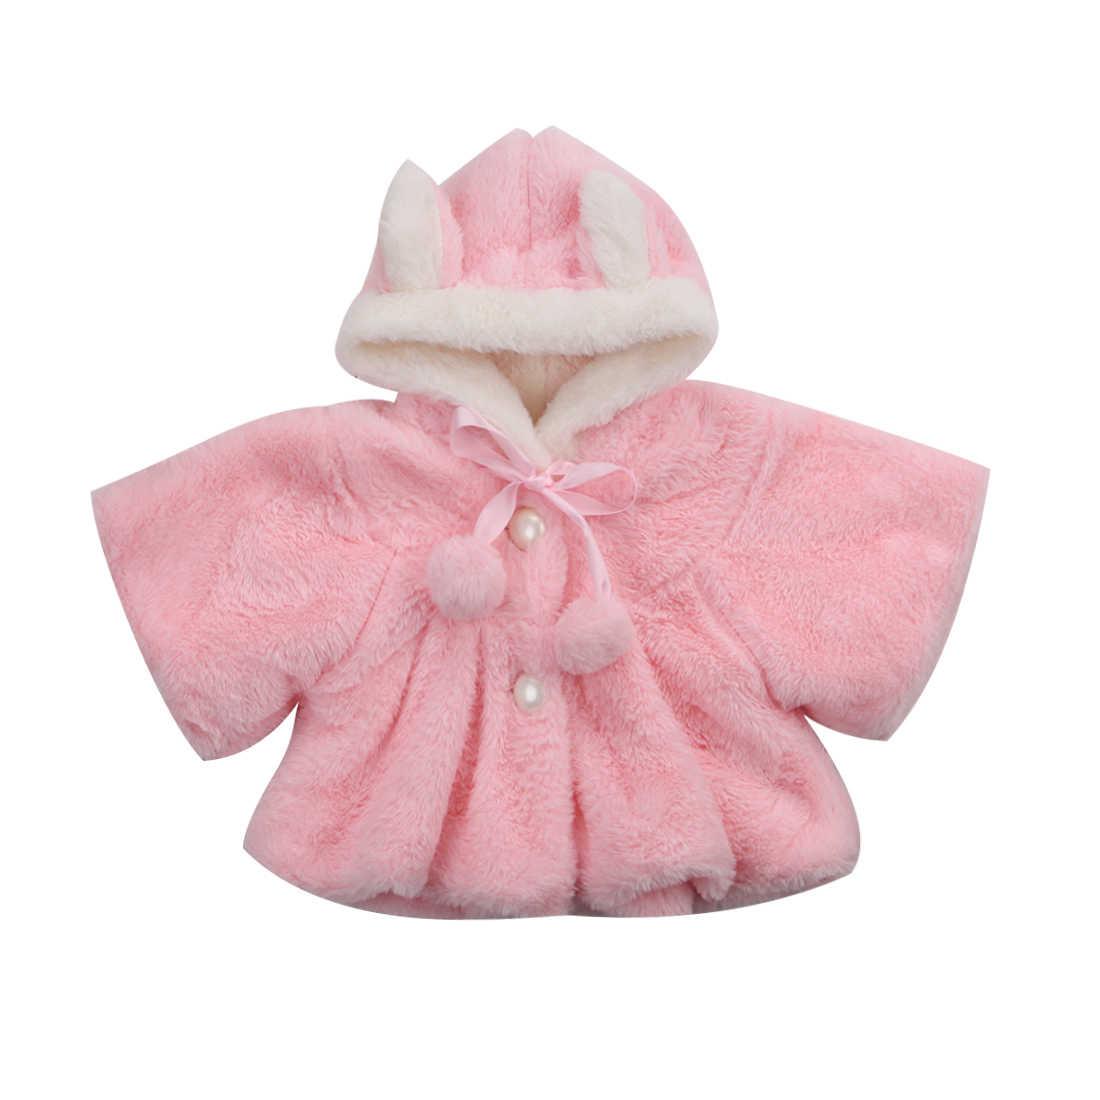 71ea6b914 Detail Feedback Questions about Cute Winter Coat For Girls Newborn ...